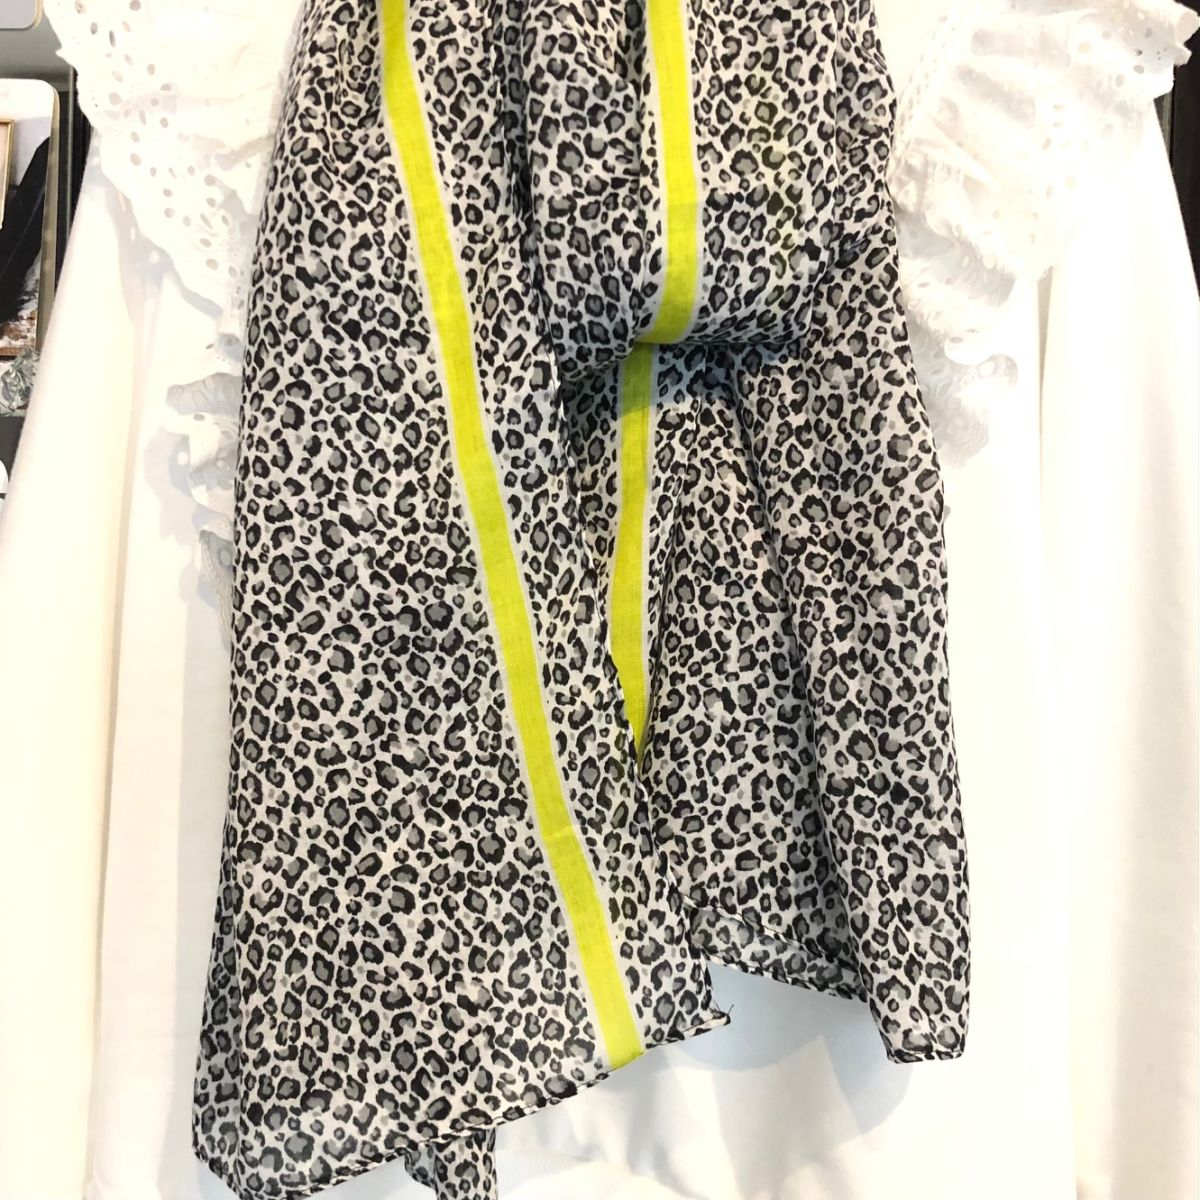 Foulard léopard bordures jaune fluo by Destele